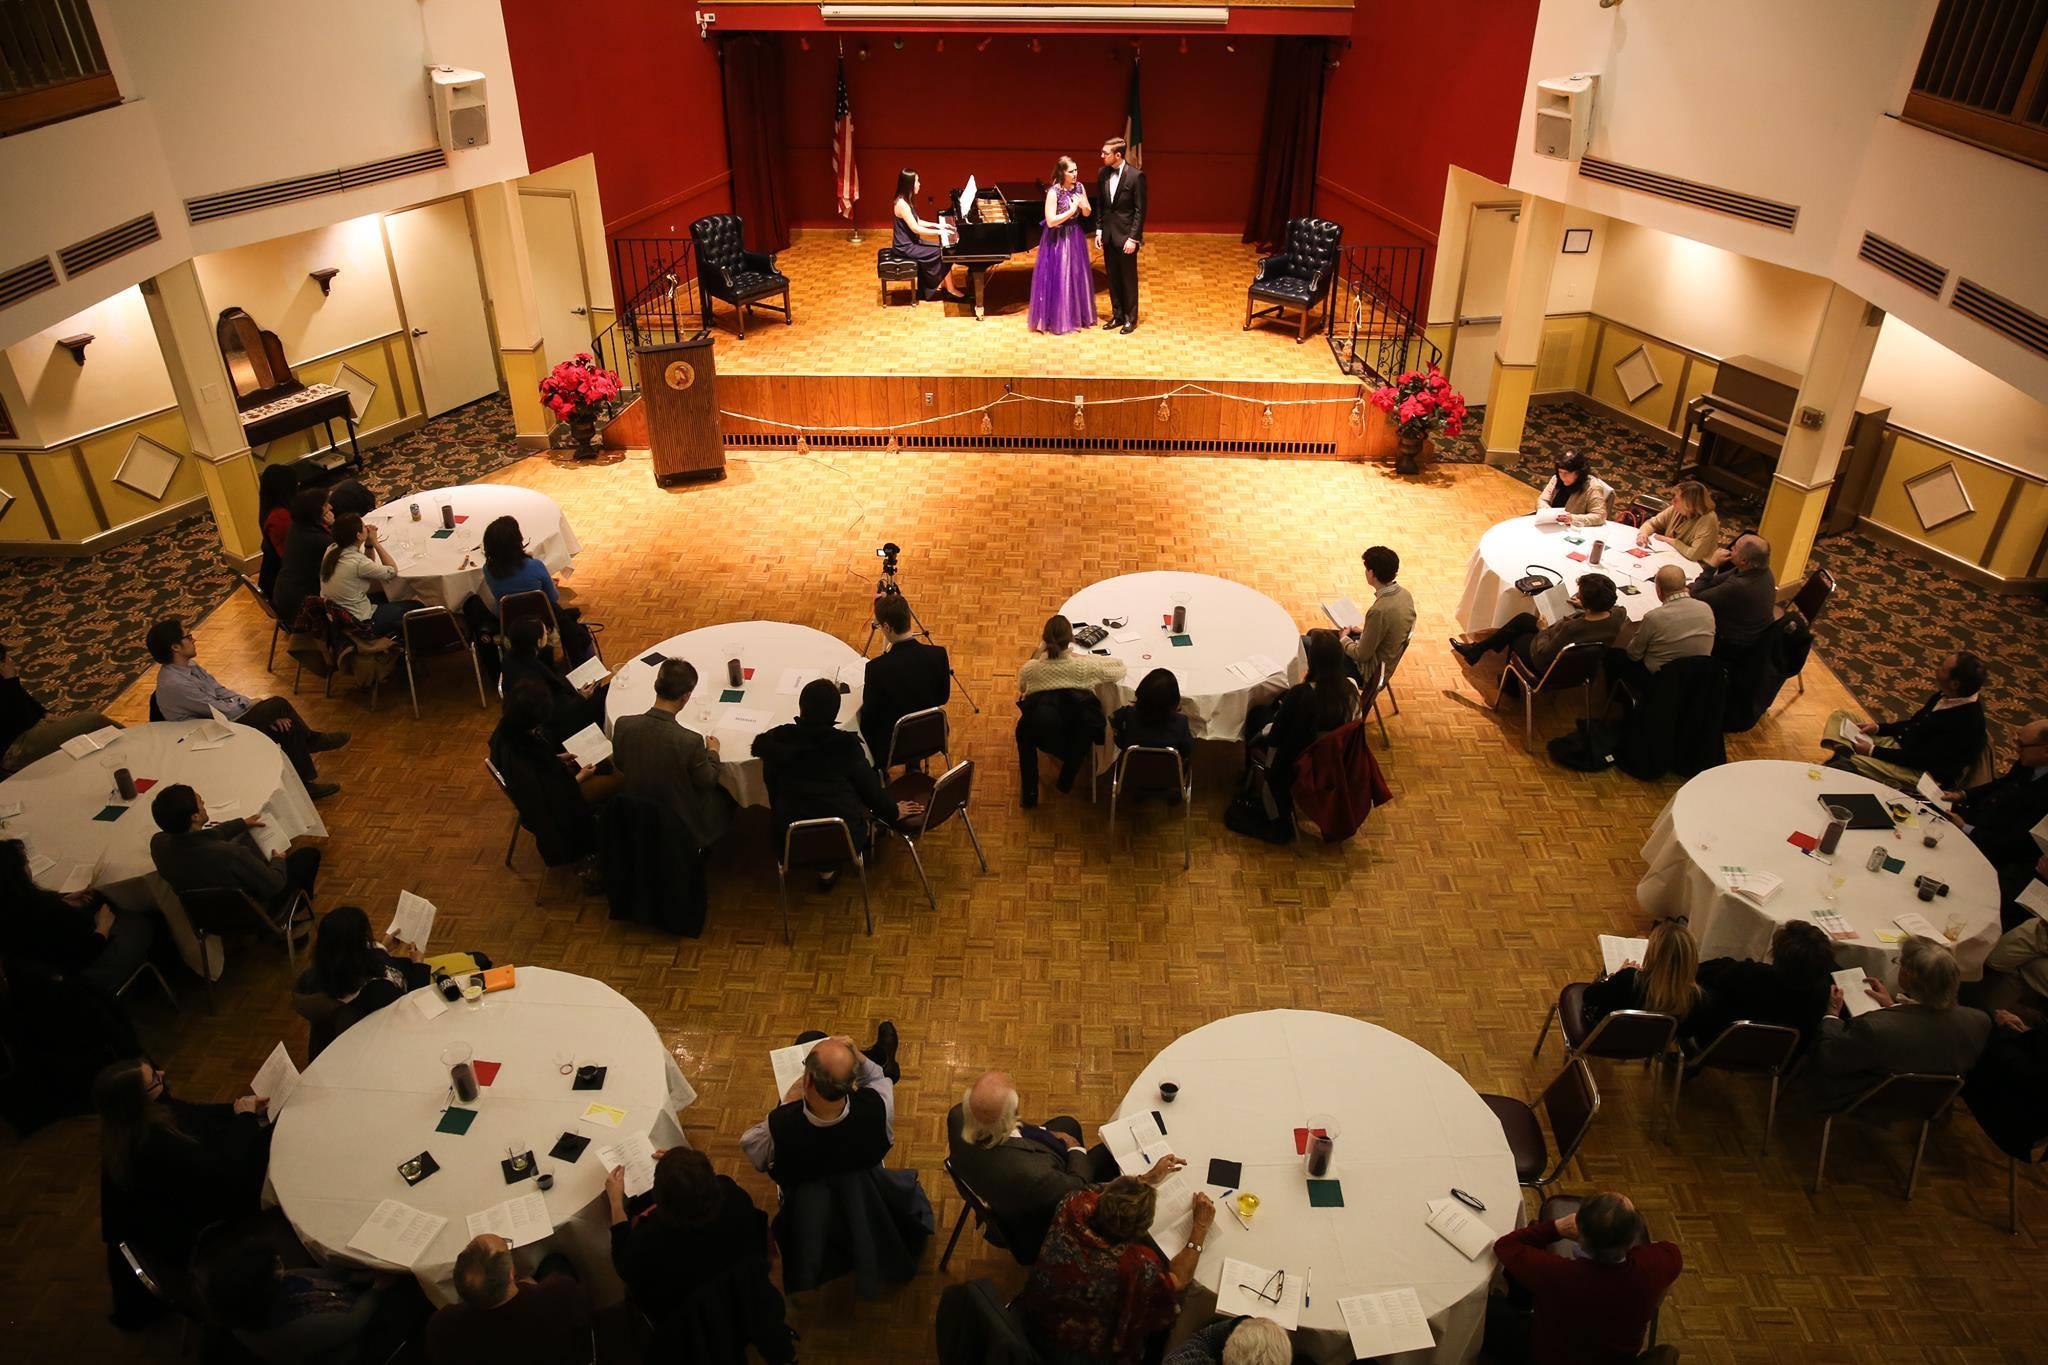 Ann performing with Elijah Blaisdell and Minju Kim during the Boston Art Song Society's Italian Art Song Recital.